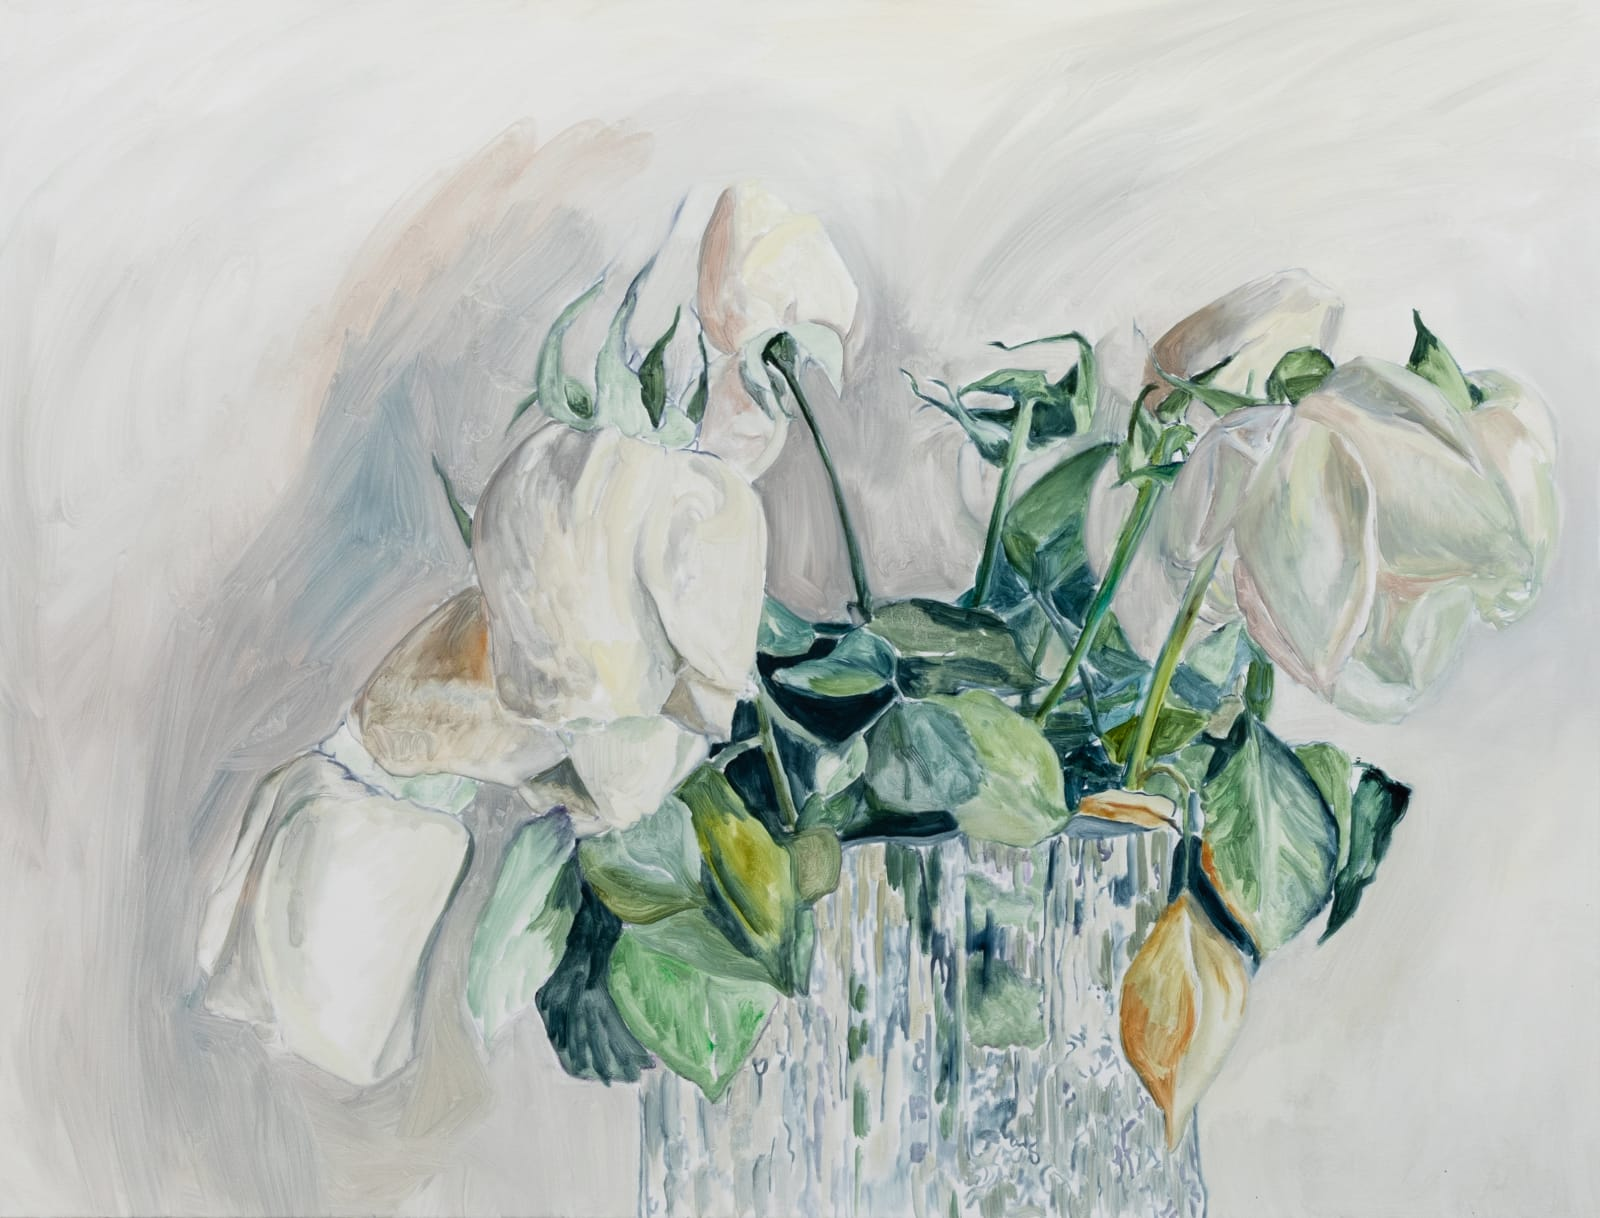 Aglaé Bassens, Morning Fatigue, 2020